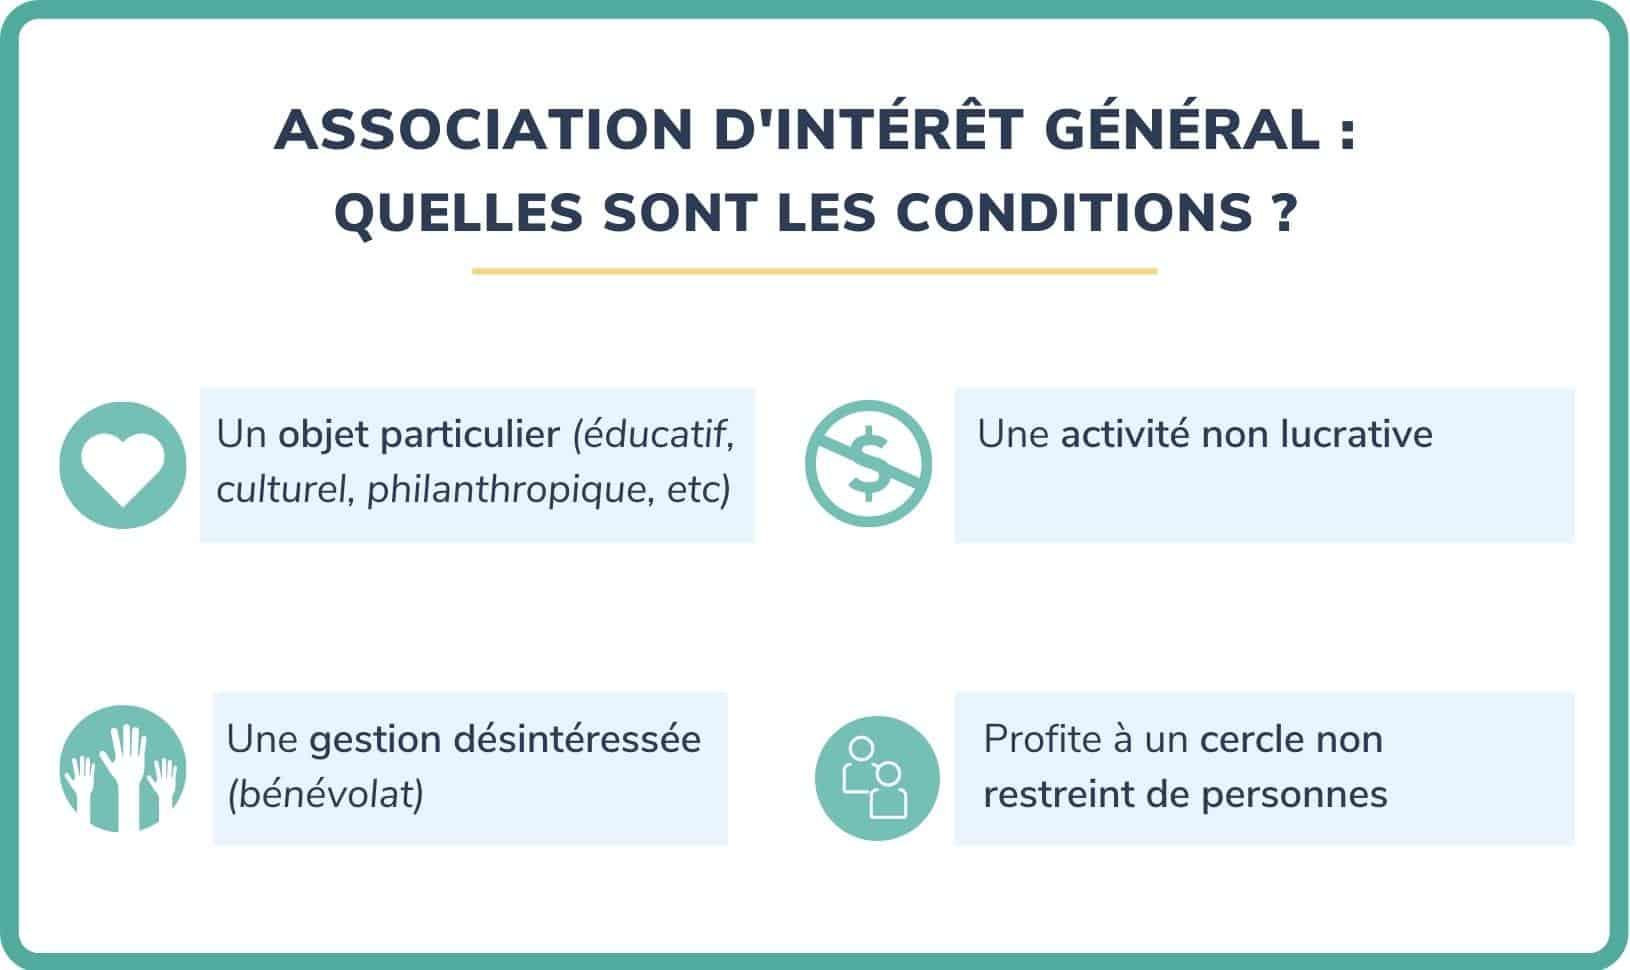 association d interet general